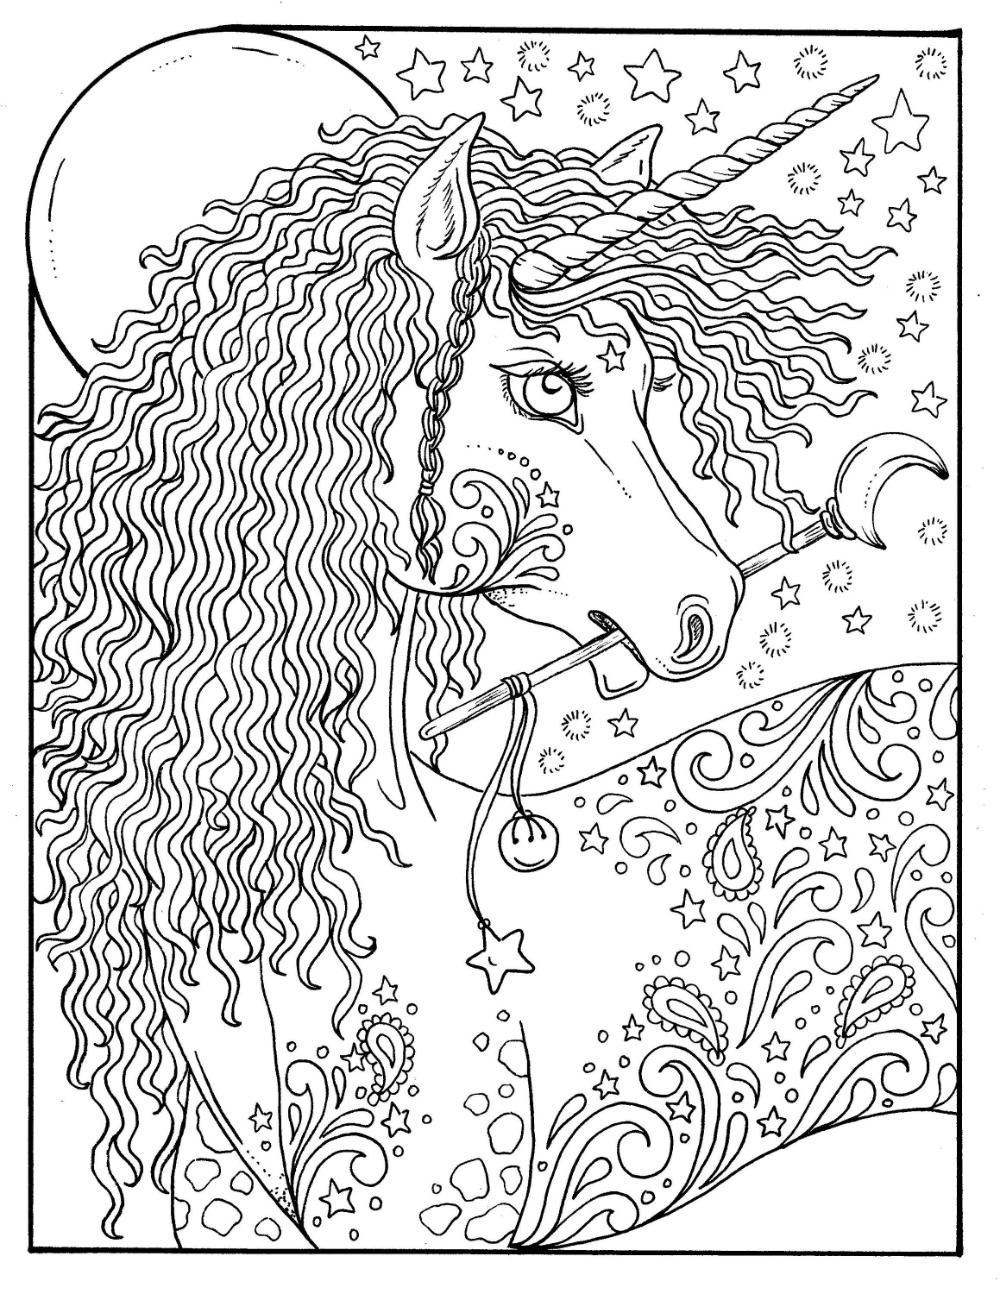 Digital Coloring Book Unicorn Dreams Magical Fantasy Etsy Unicorn Coloring Pages Horse Coloring Pages Coloring Pages